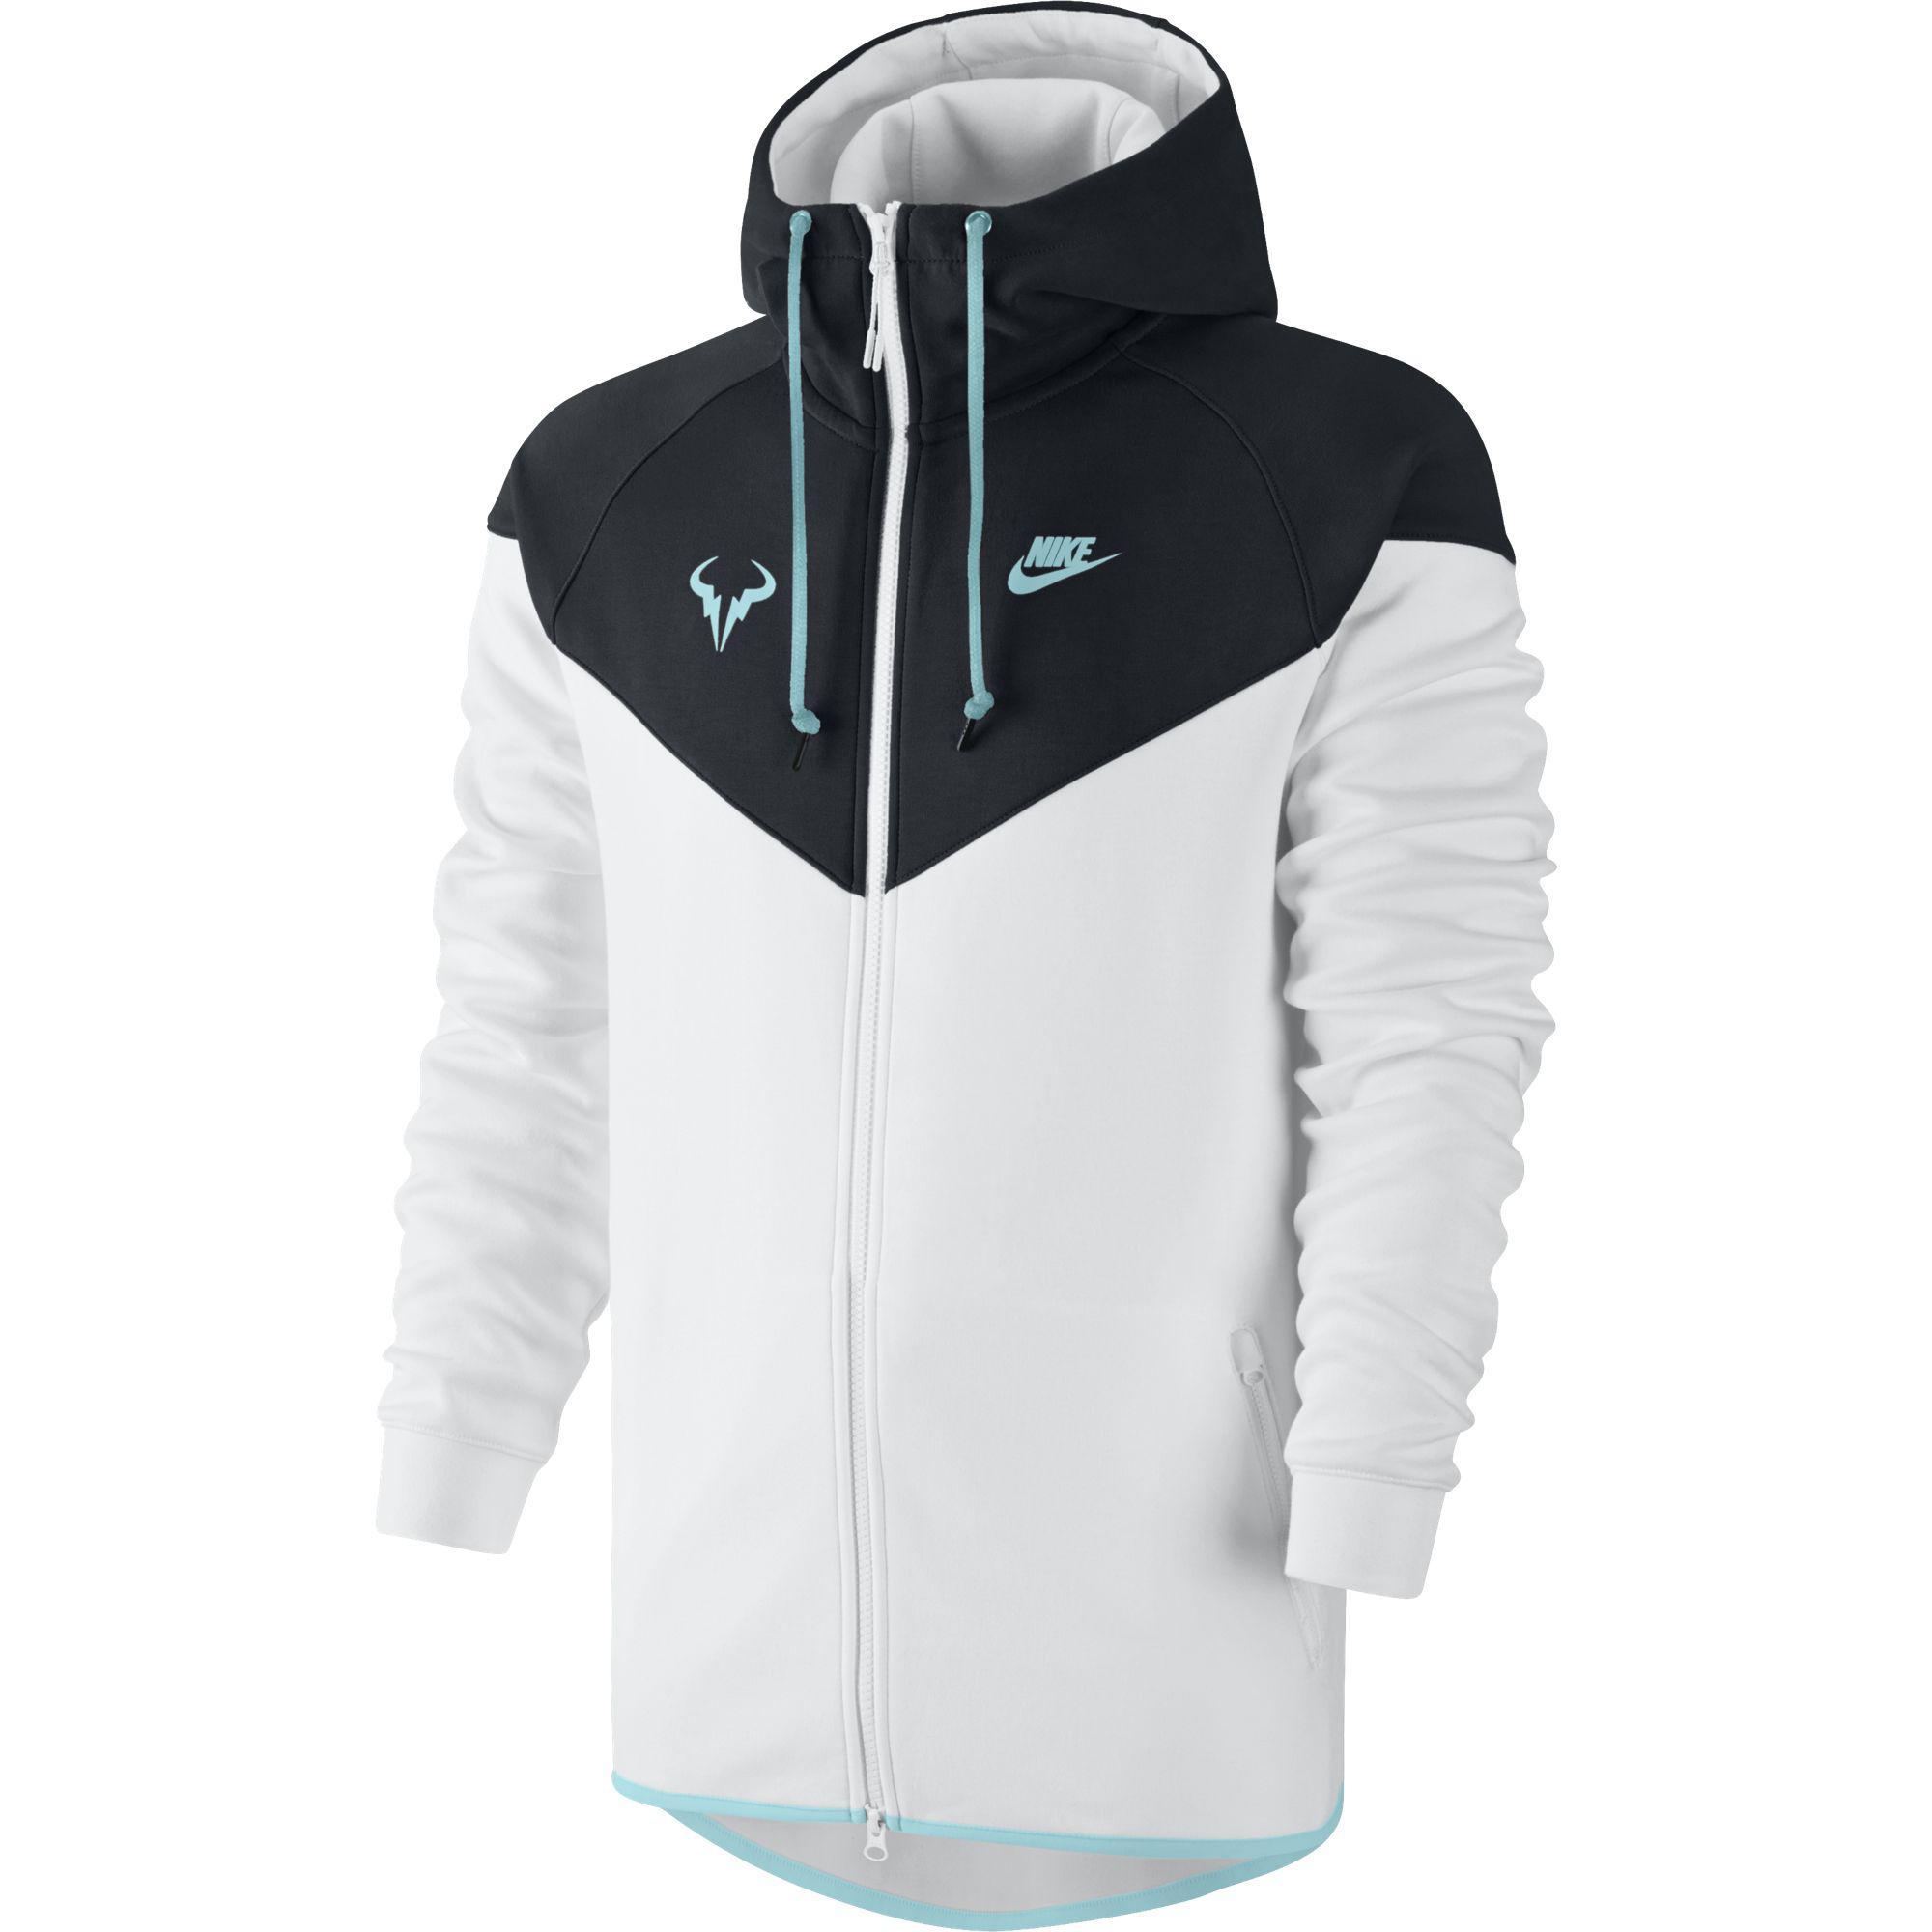 667d56147846 Nike Mens Premier Rafa Jacket - Black White - Tennisnuts.com